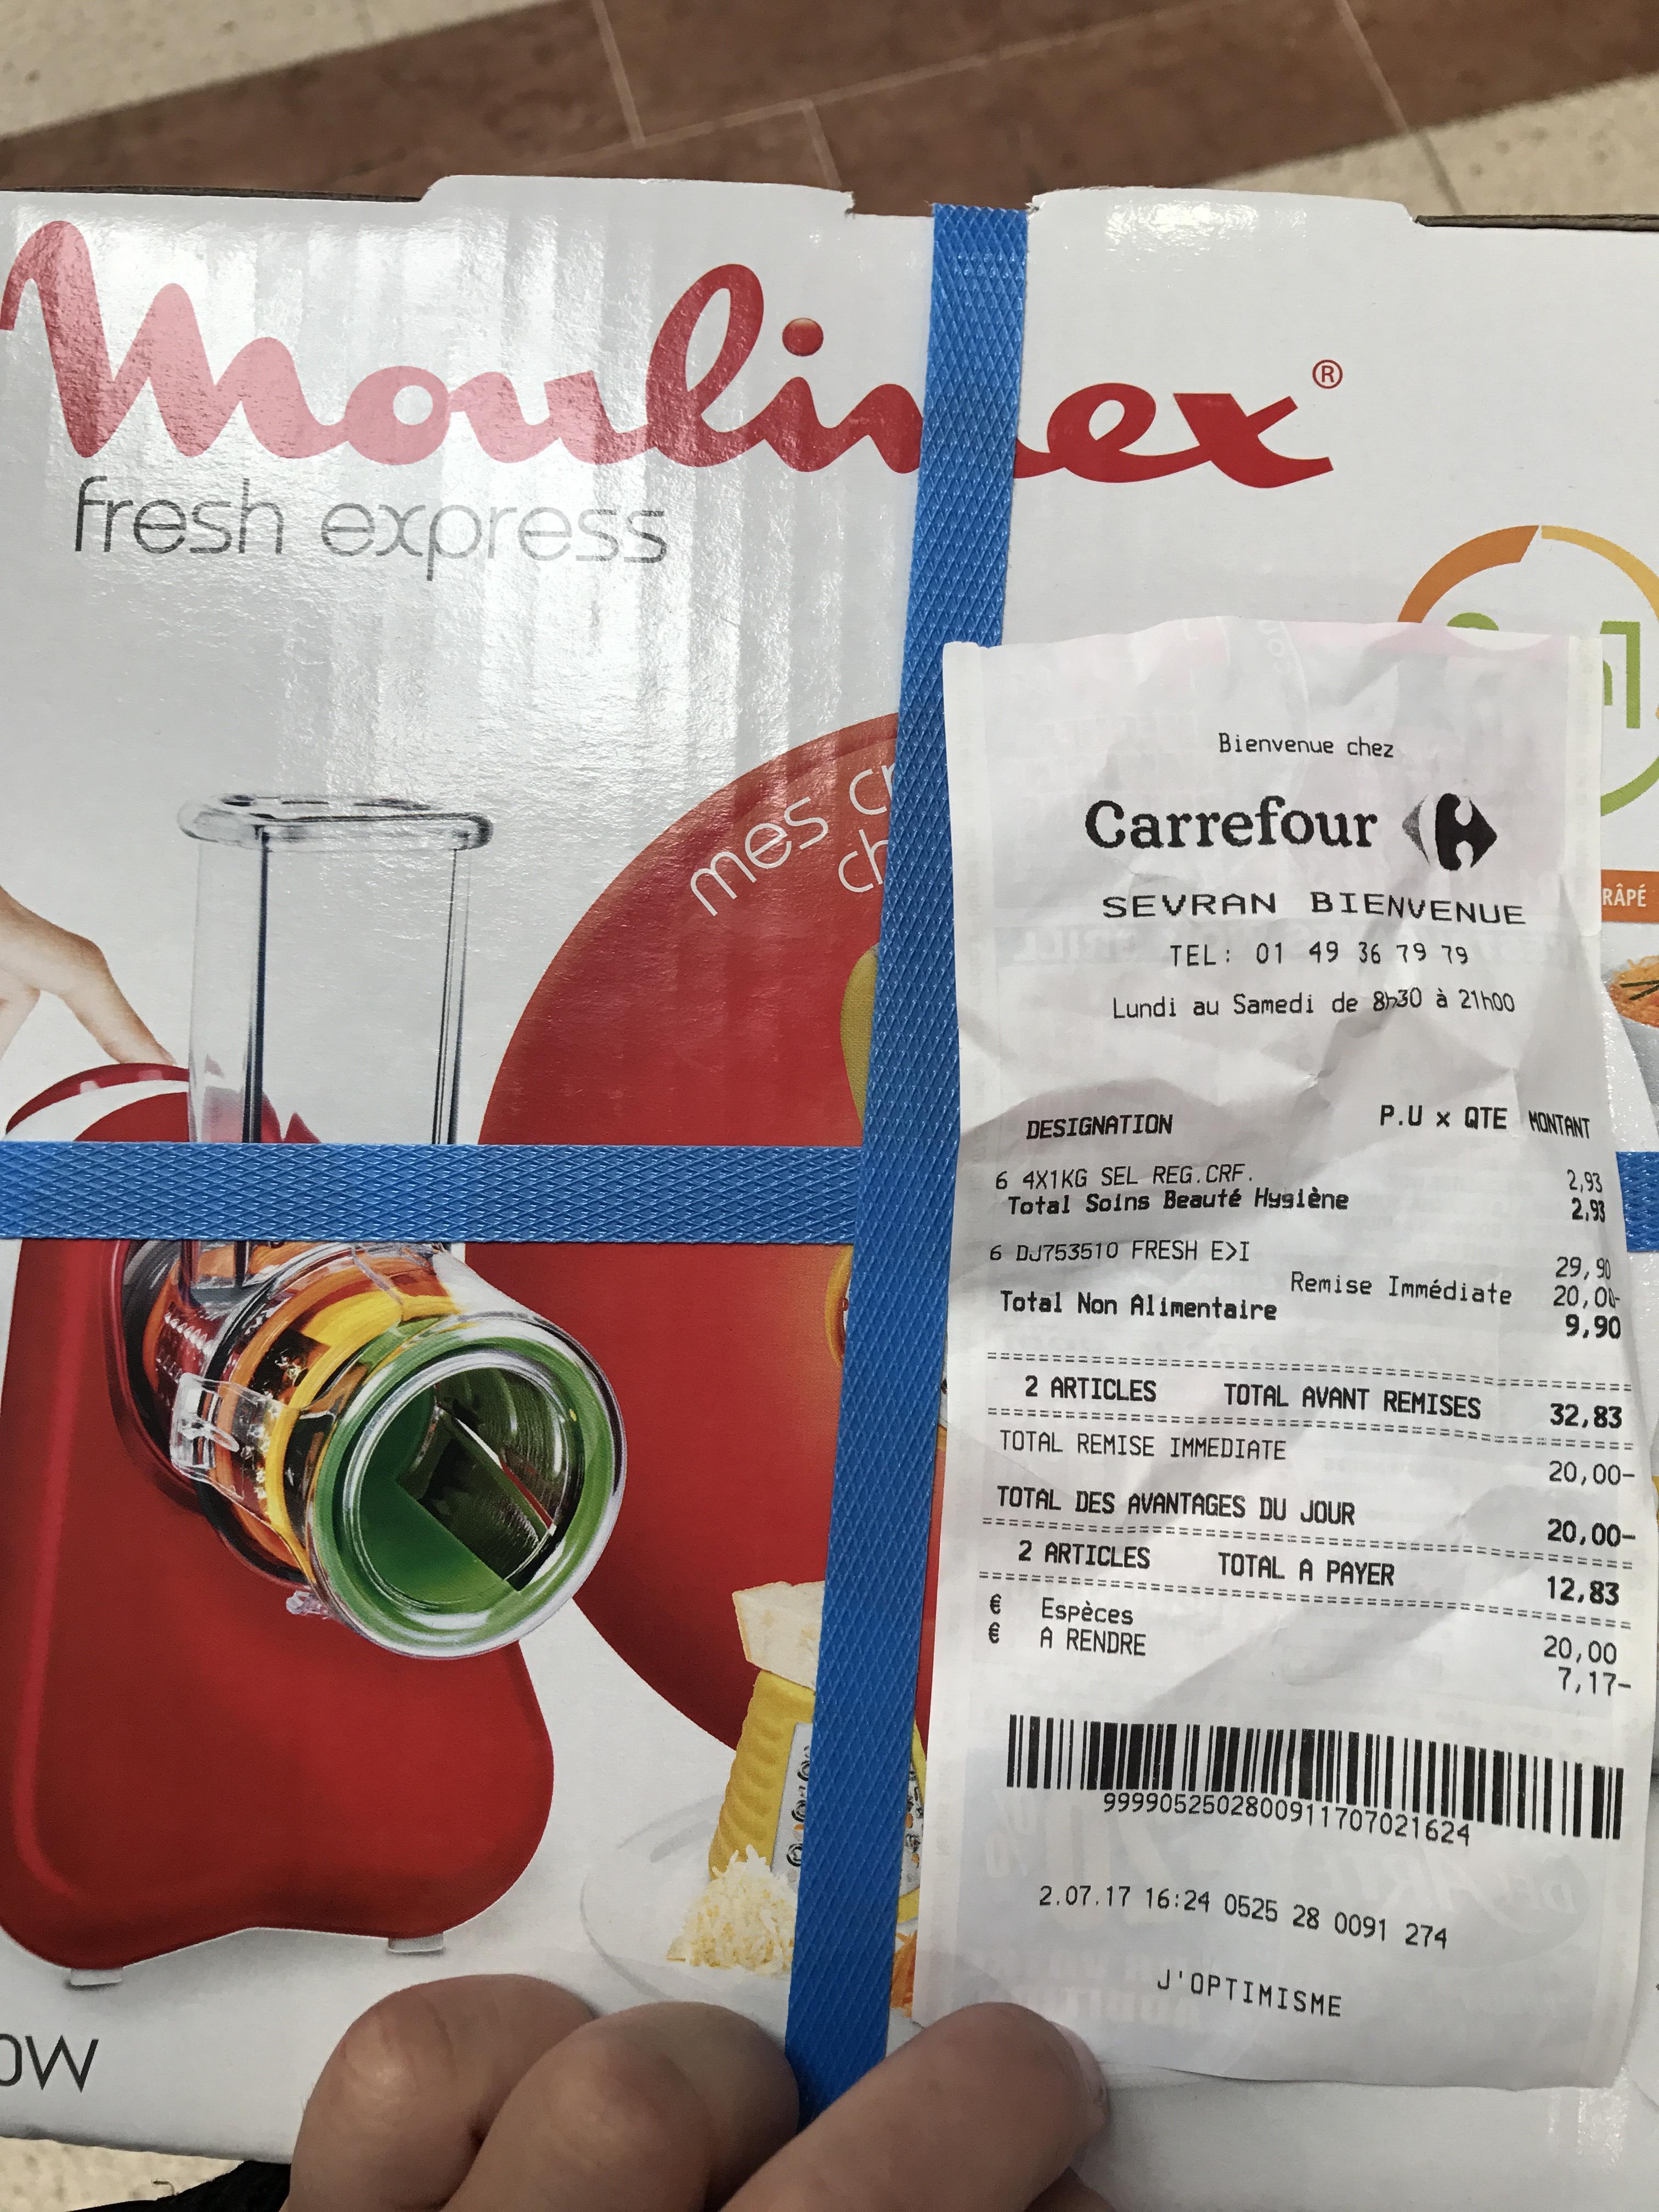 Machine Râpe Moulinex Fresh Express DJ753510